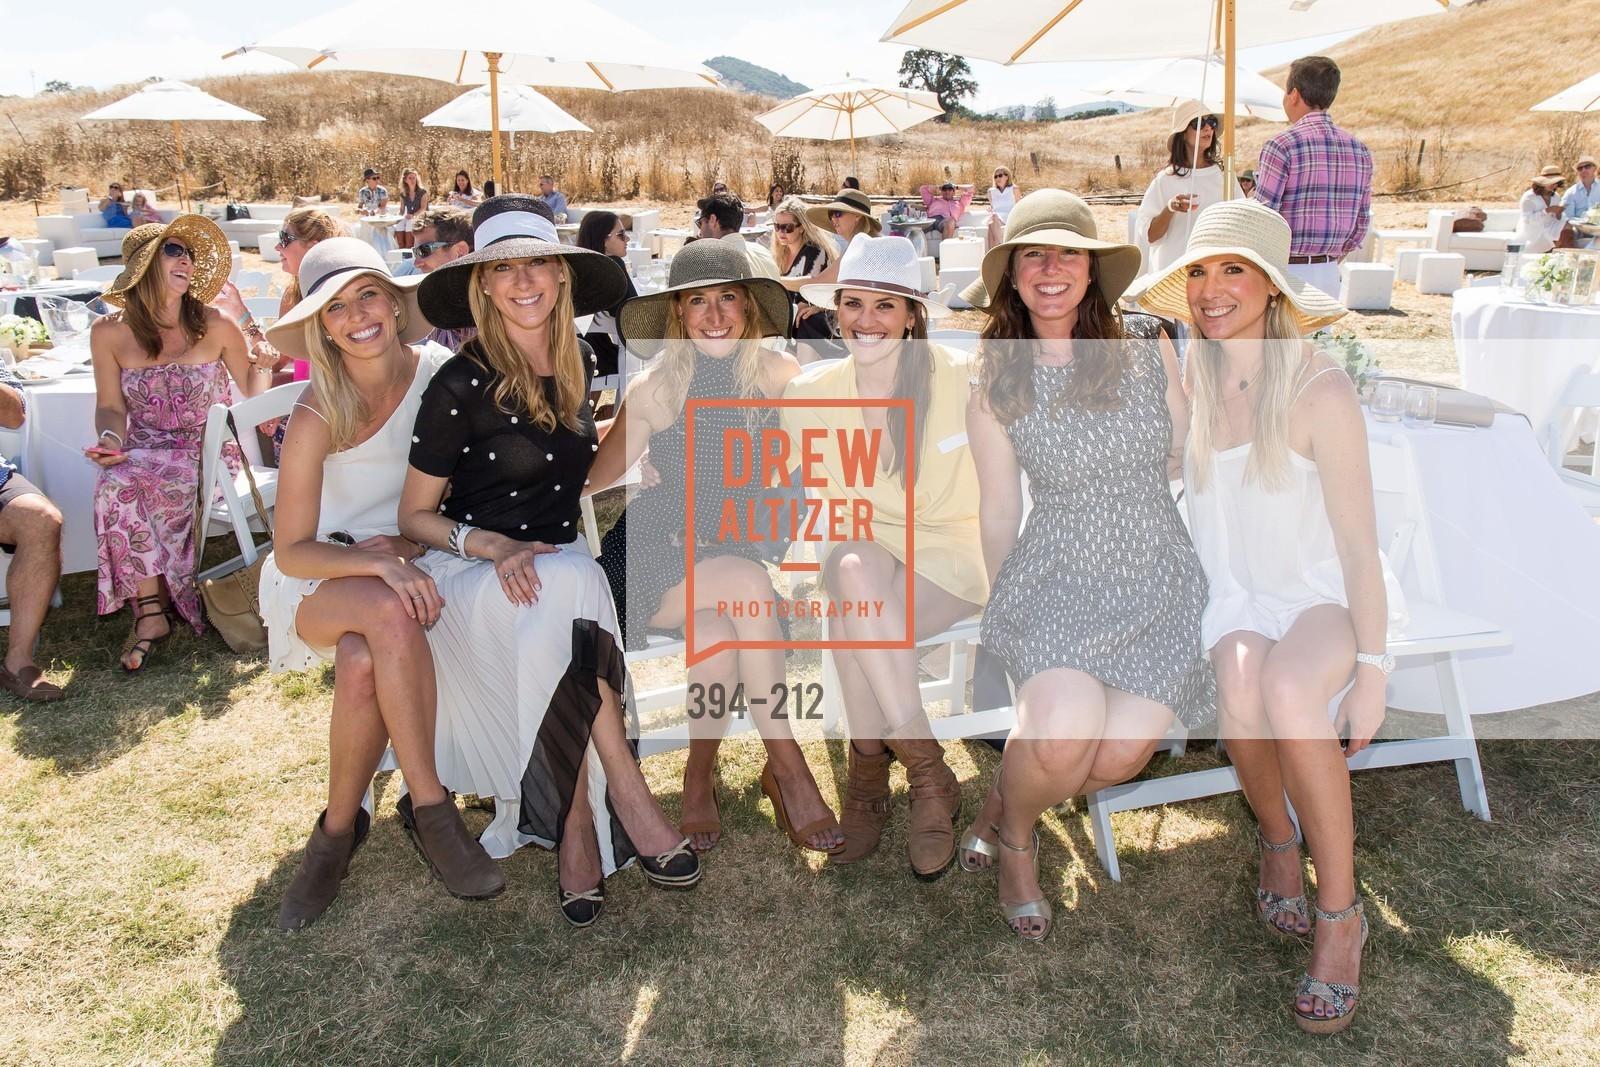 Kate Jorgensen, Lauren Wolfe, Meredith Kendall, Jennifer Hirsch, Samantha Hartwell, Photo #394-212